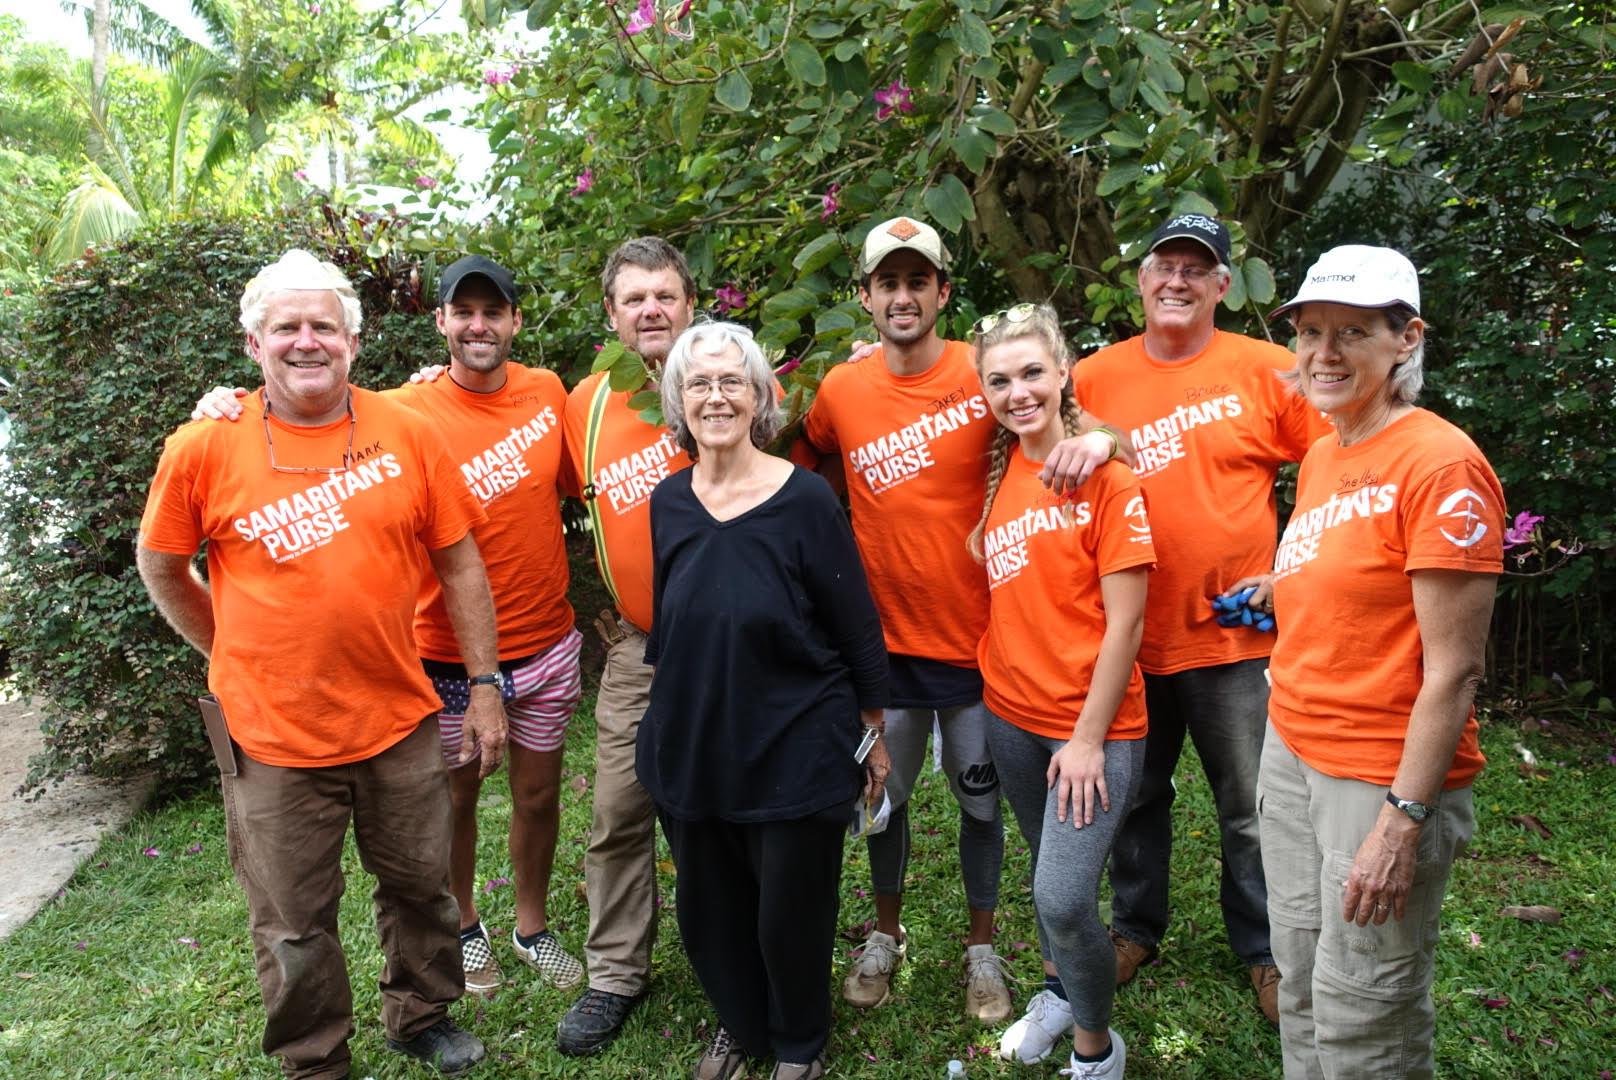 Group Picture of Samaritan's Purse Volunteers